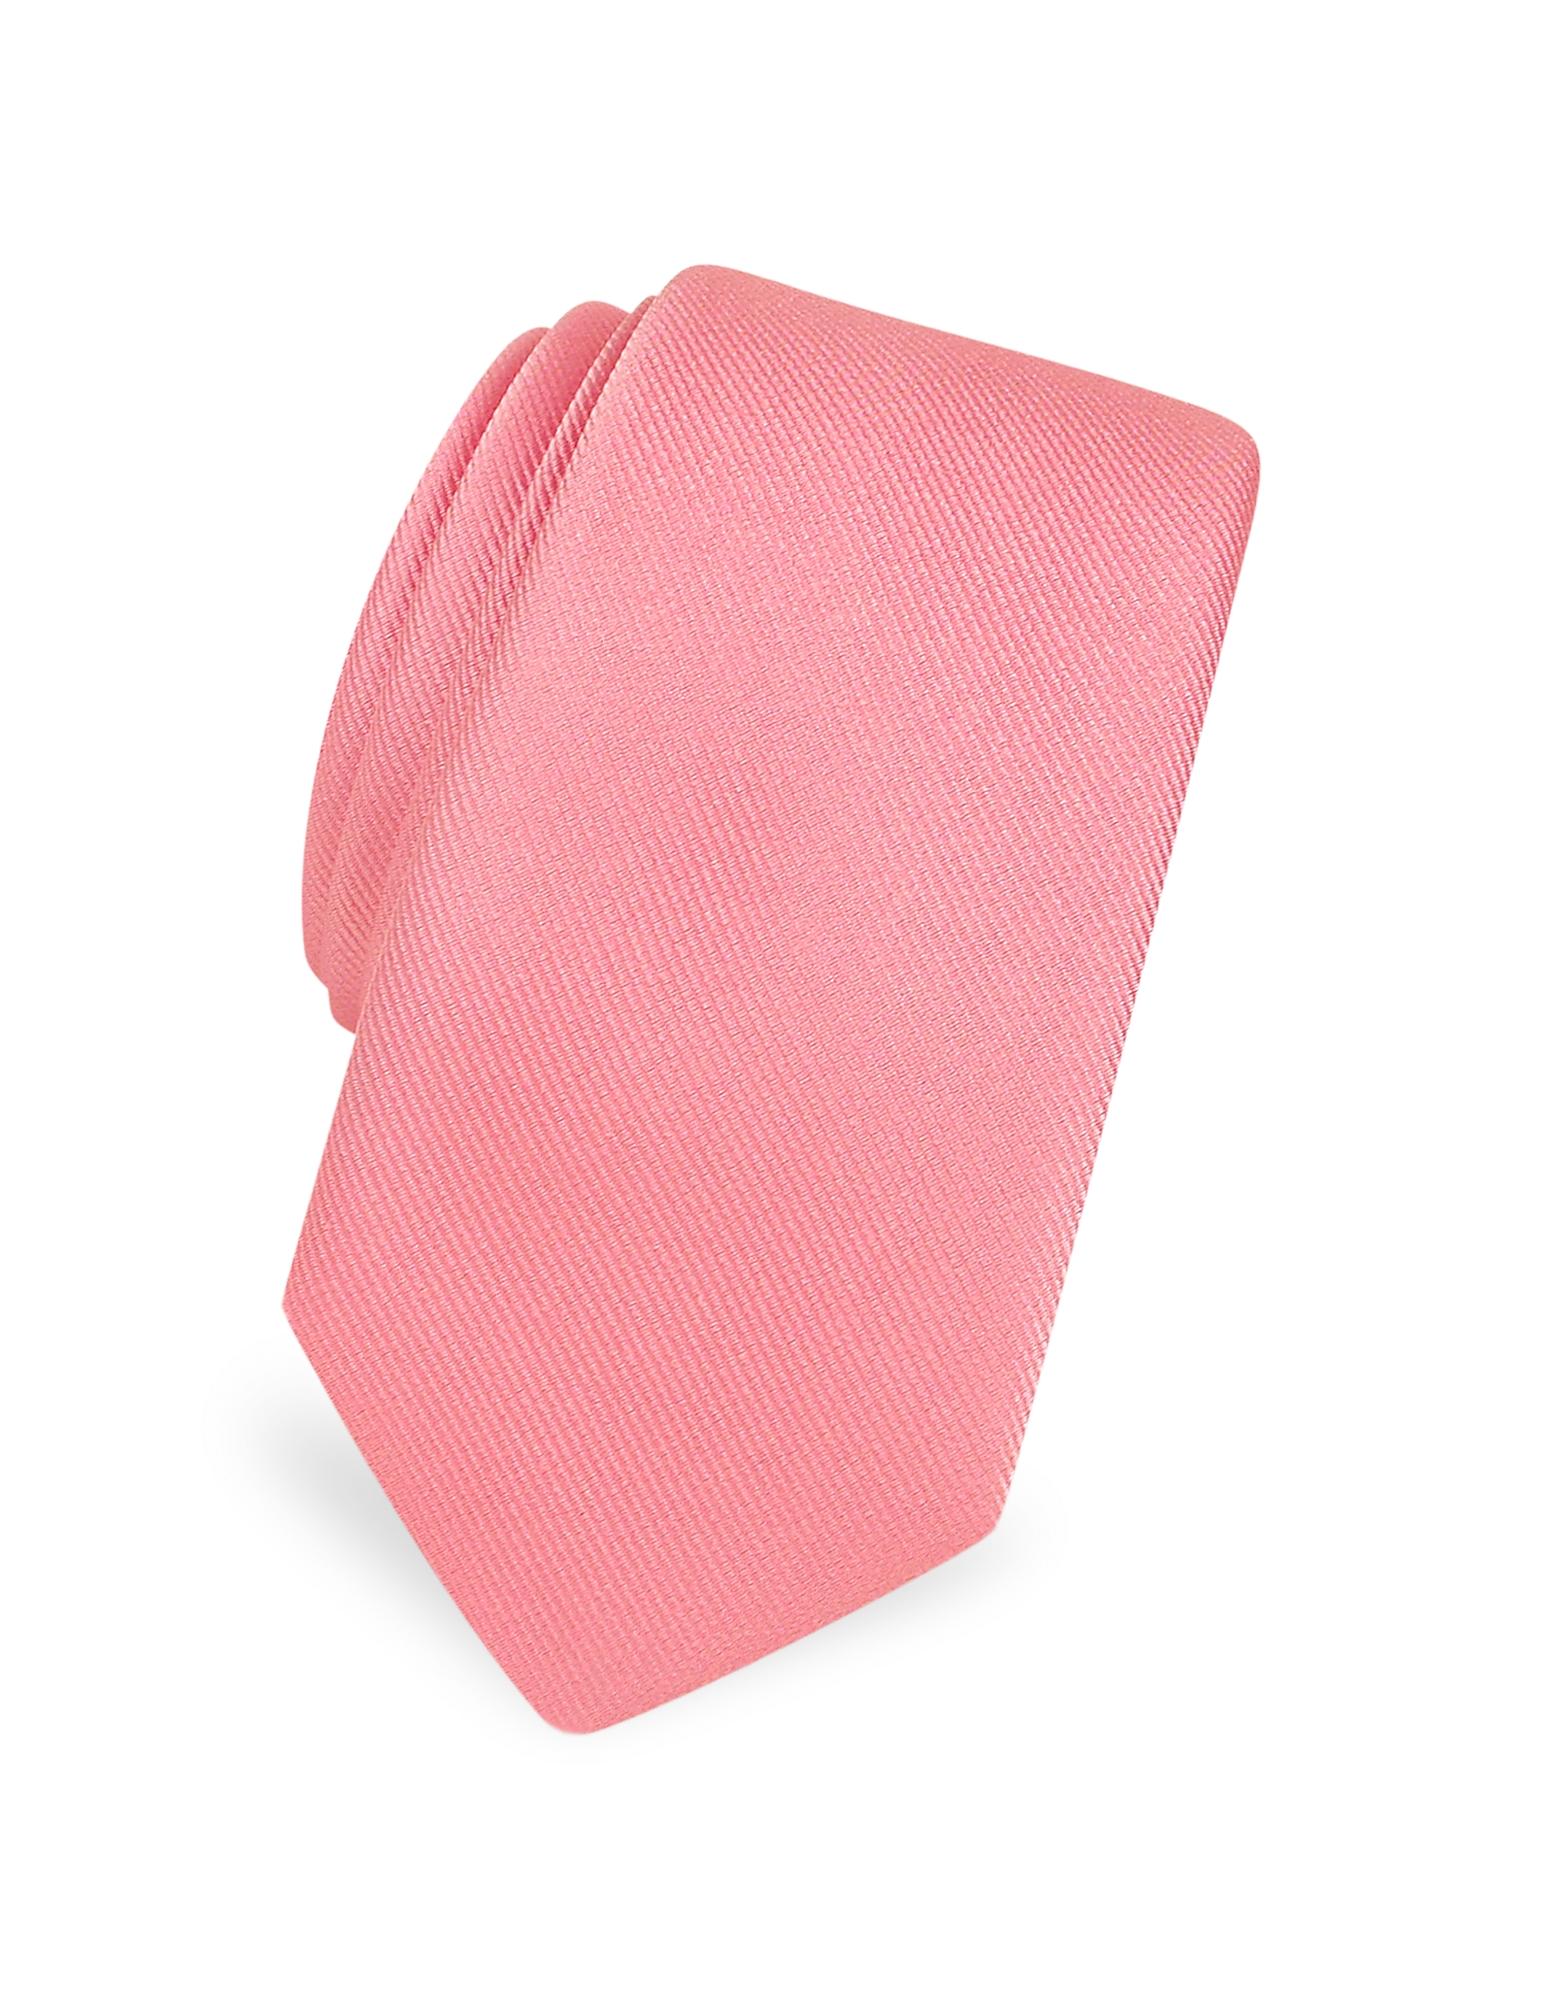 Forzieri Ties, Solid Twill Silk Narrow Tie